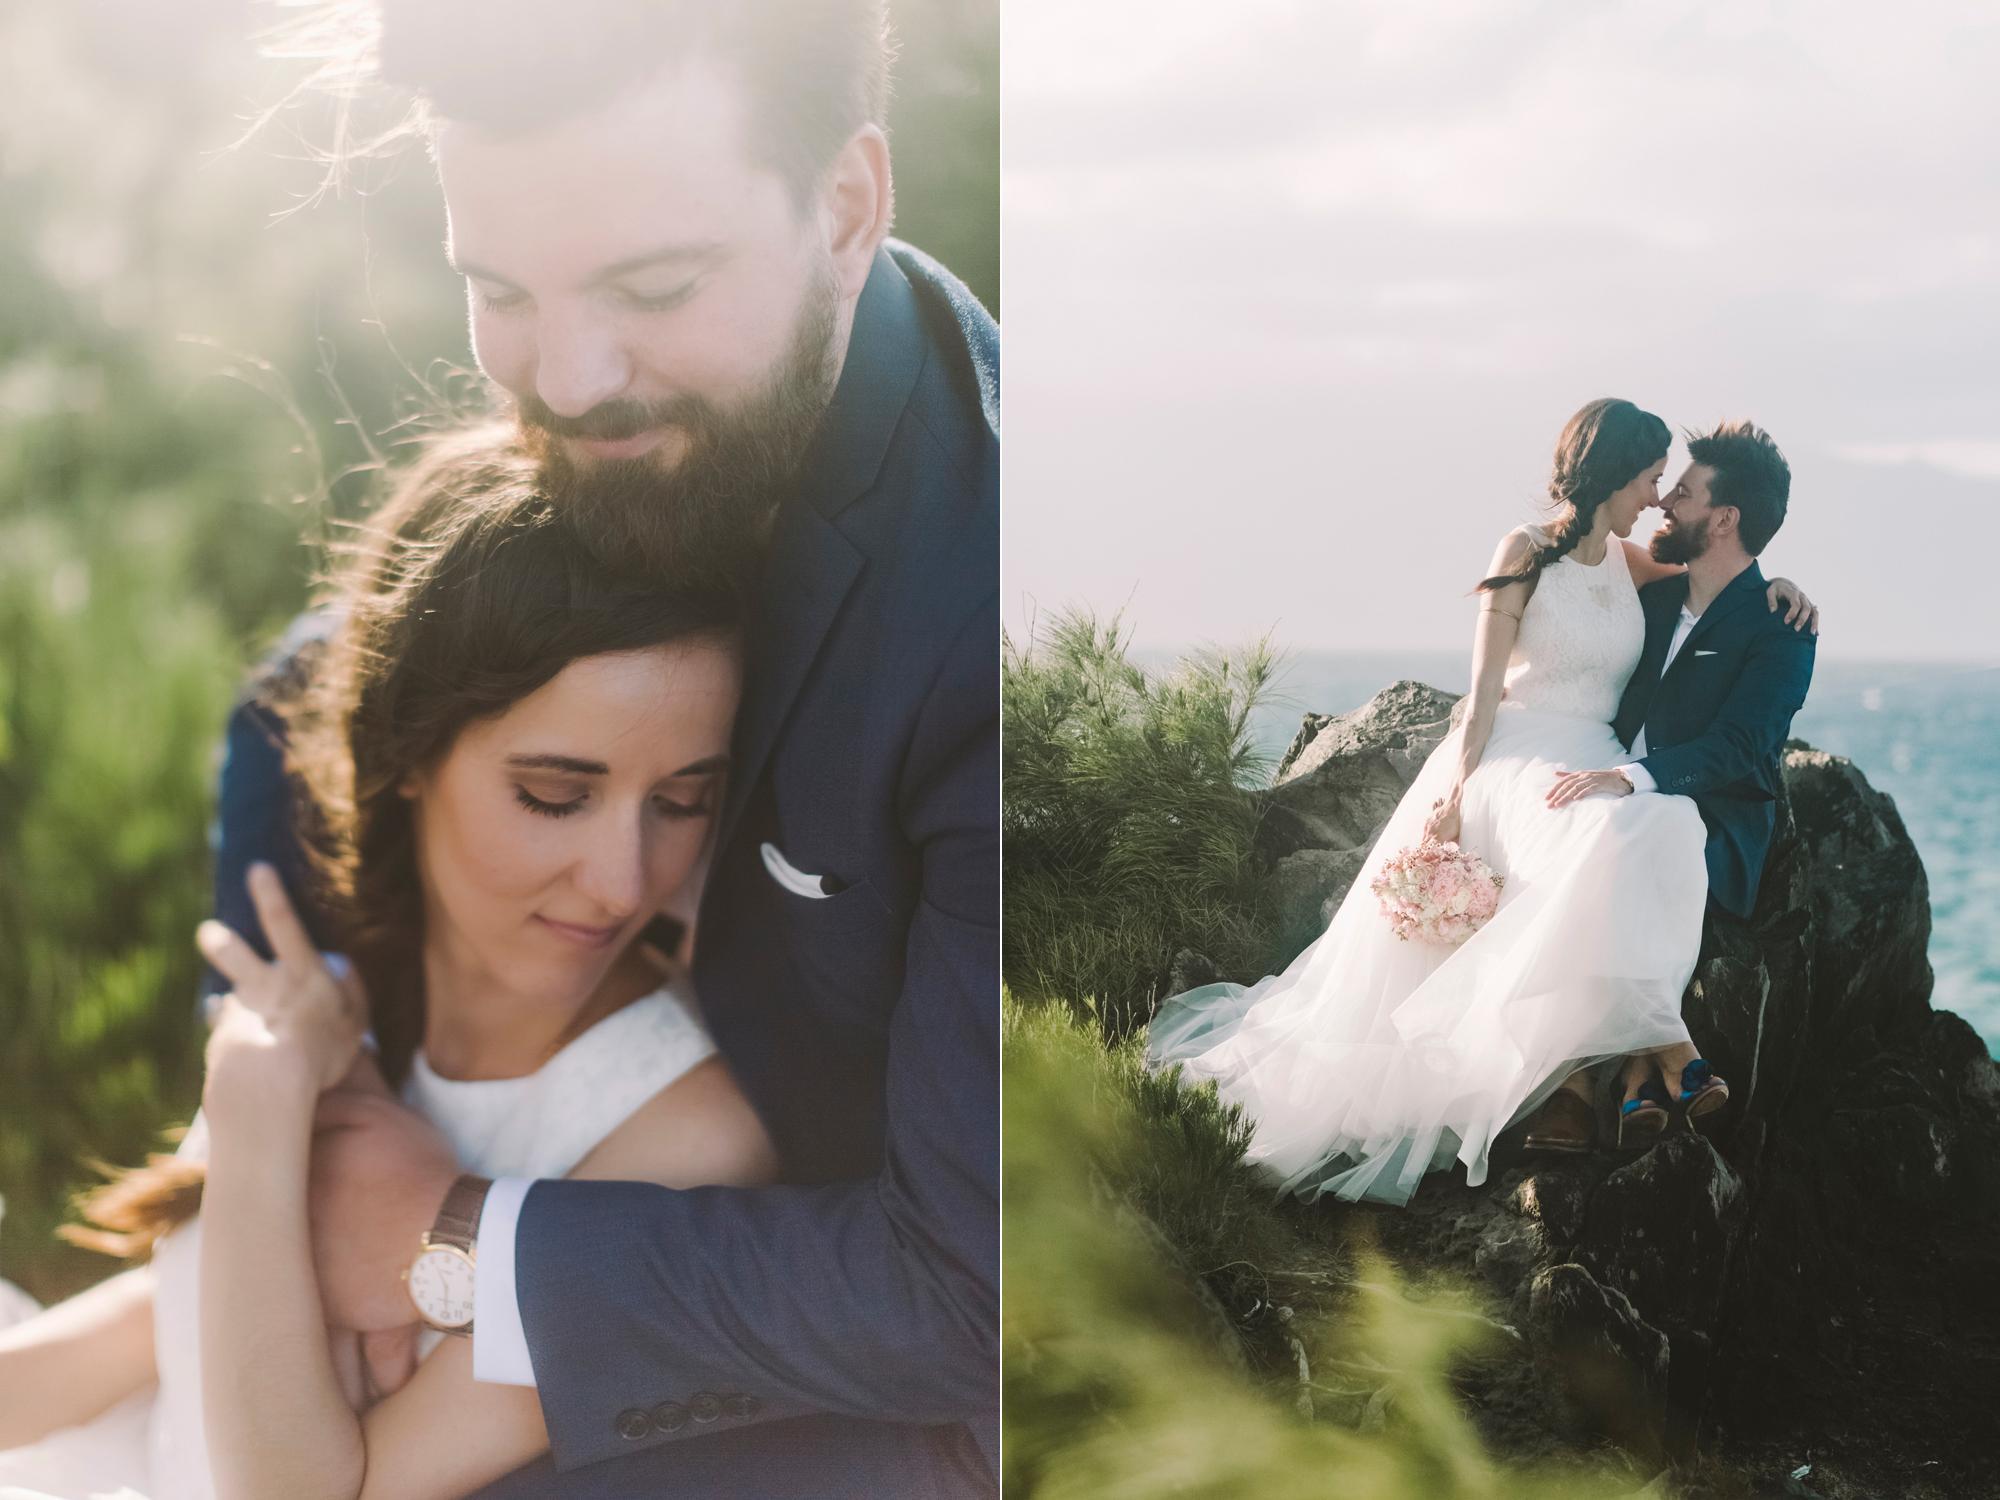 angie-diaz-photography-maui-wedding-ironwoods-beach-47.jpg